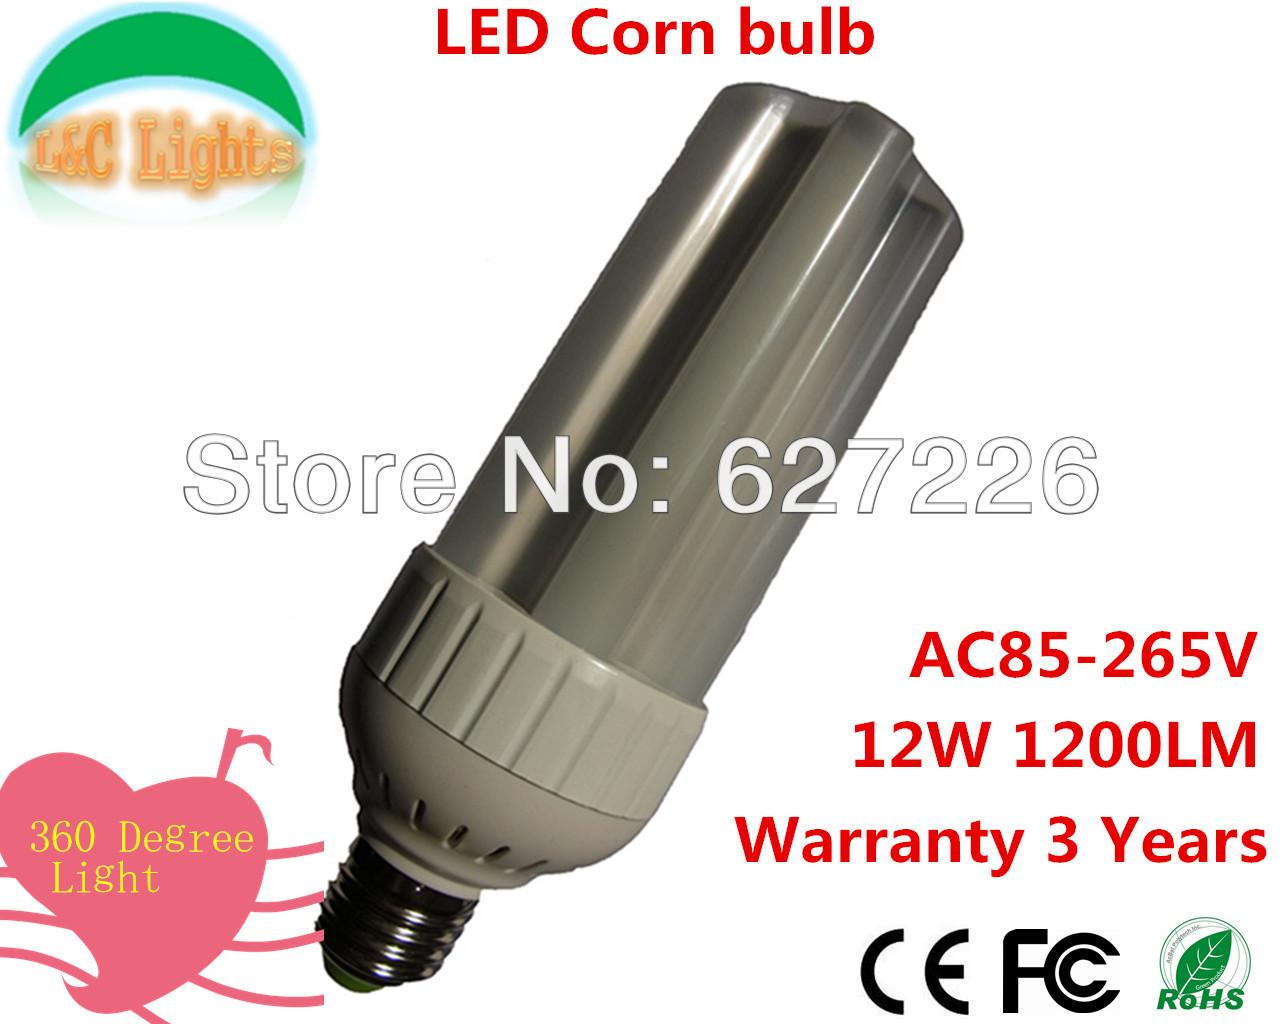 Hot selling 120 leds SMD 3014 E27 LED AC85-265V 12W LED bulb lamp ,Warm white/white LED Corn Bulb Light,waterproof,10Pcs a Lot(China (Mainland))